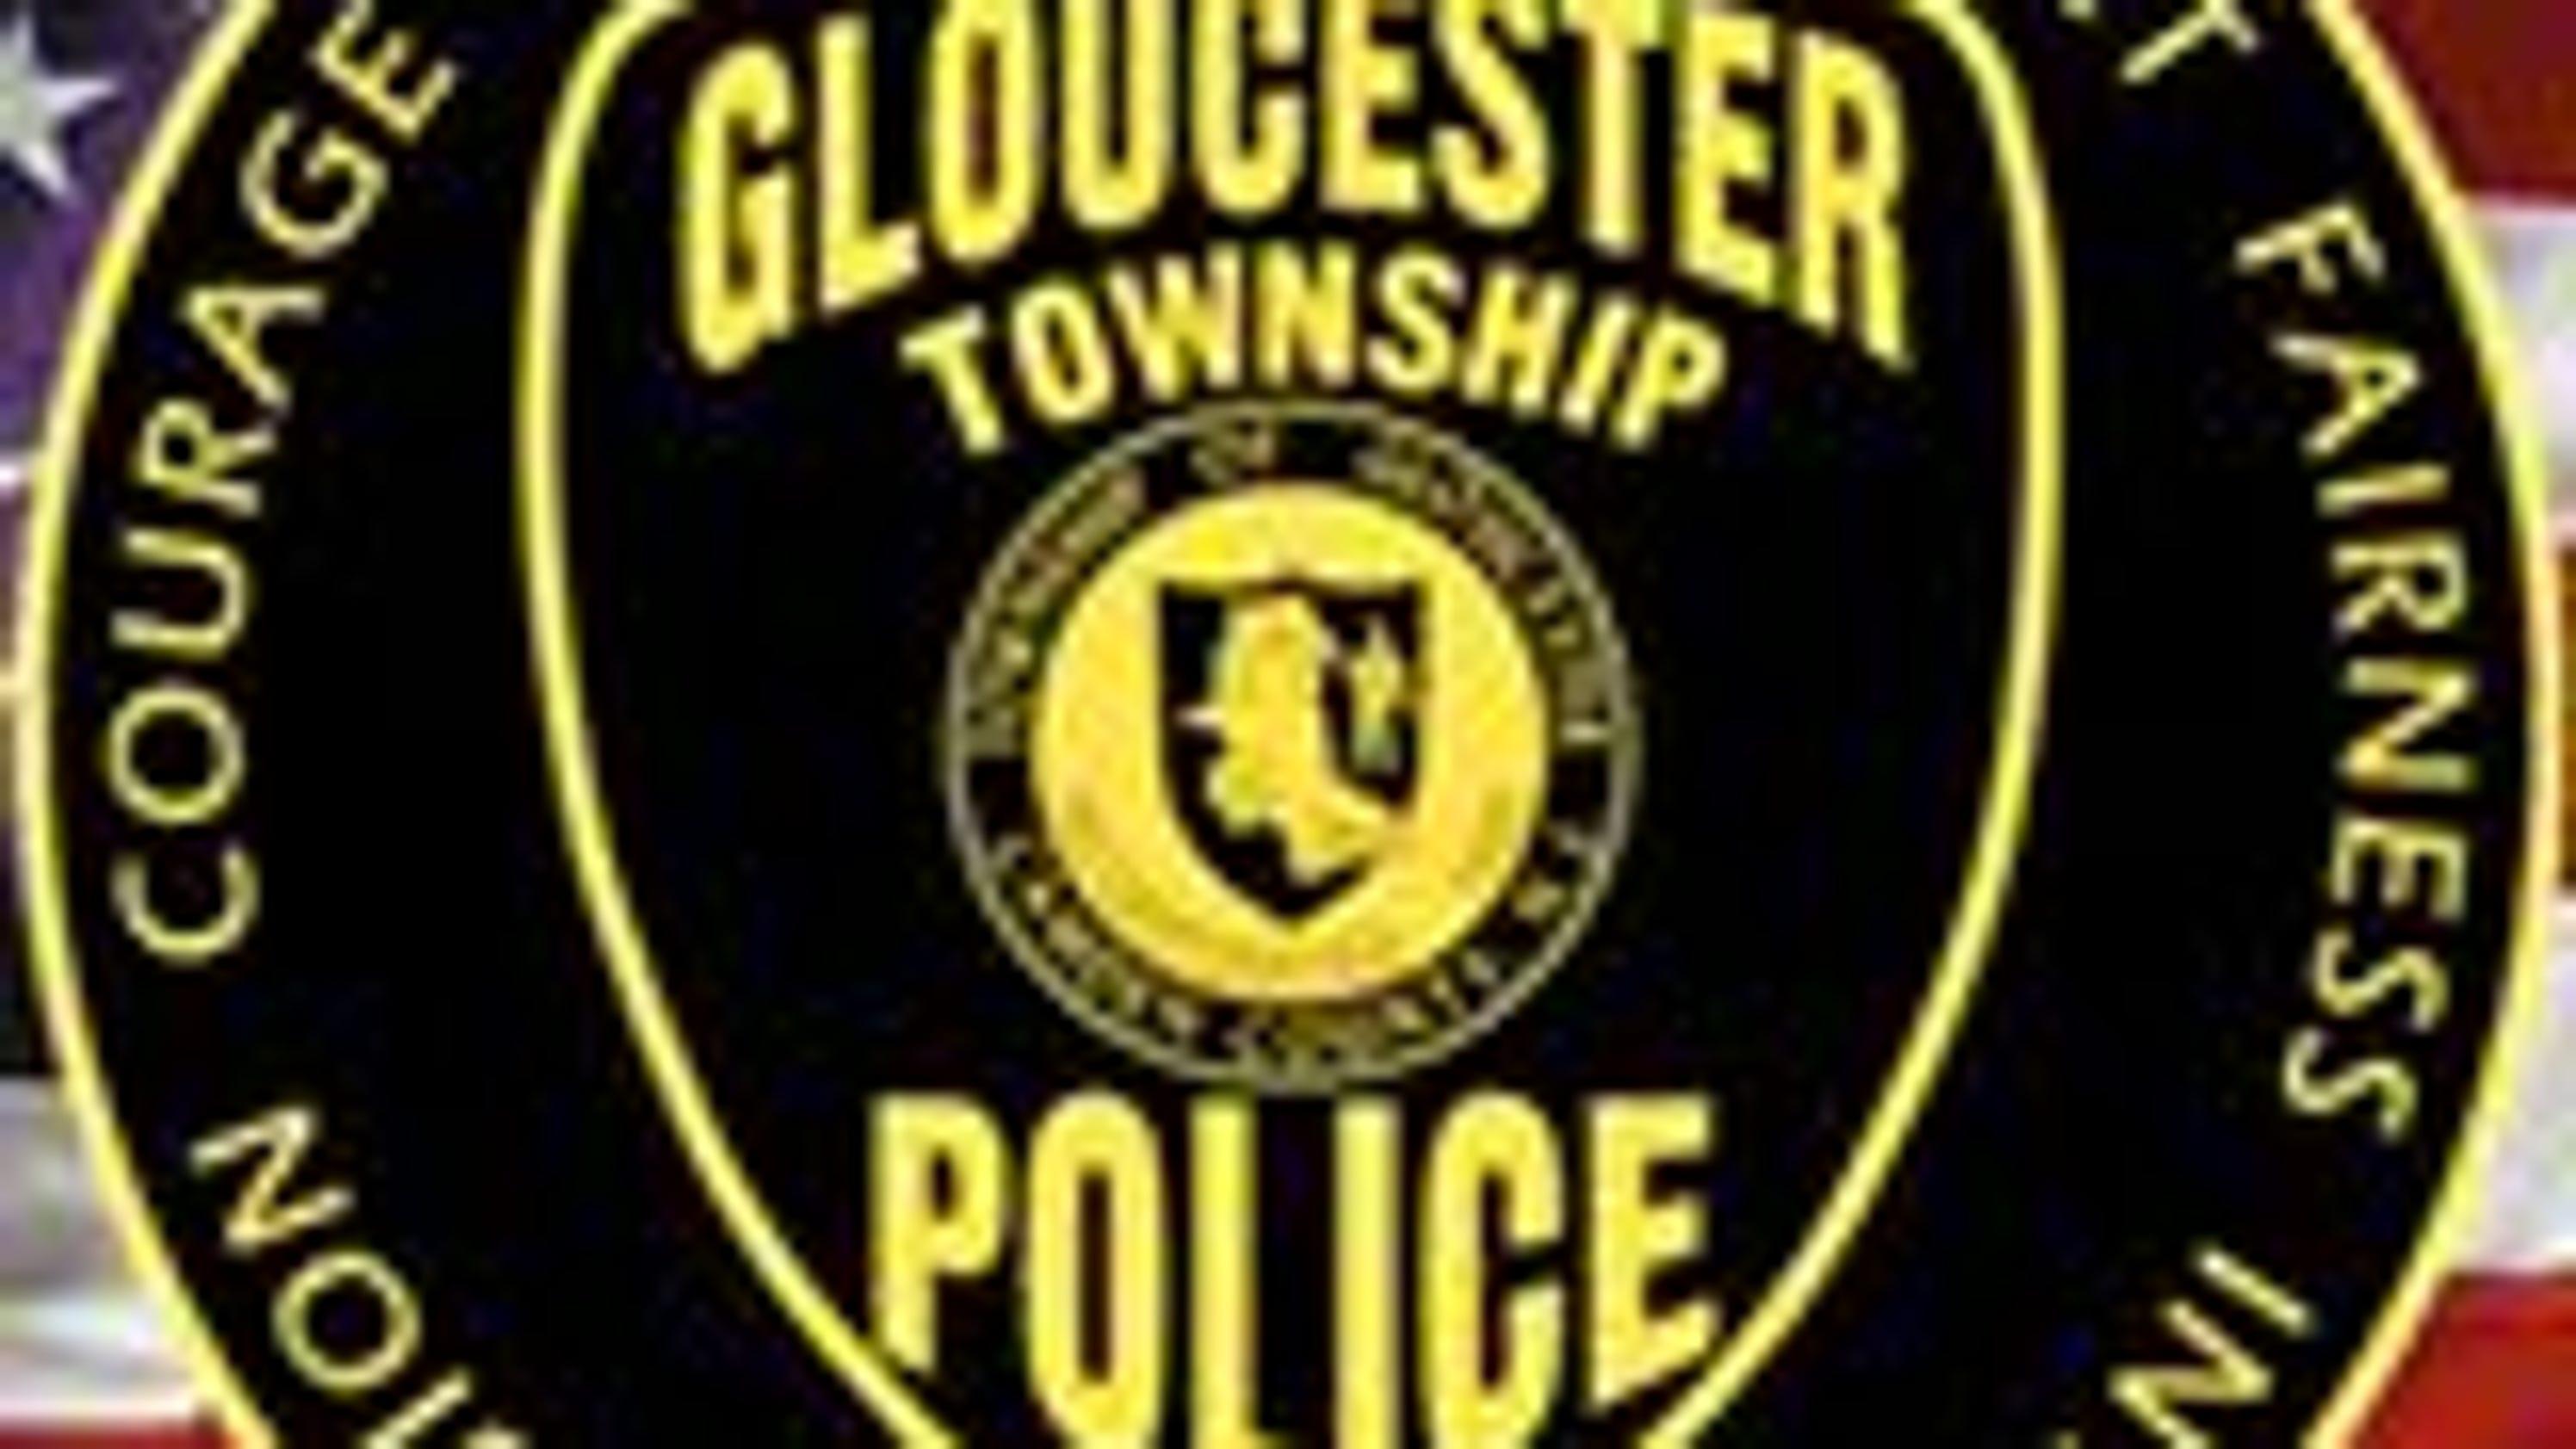 Gloucester Twp police hosting online sales